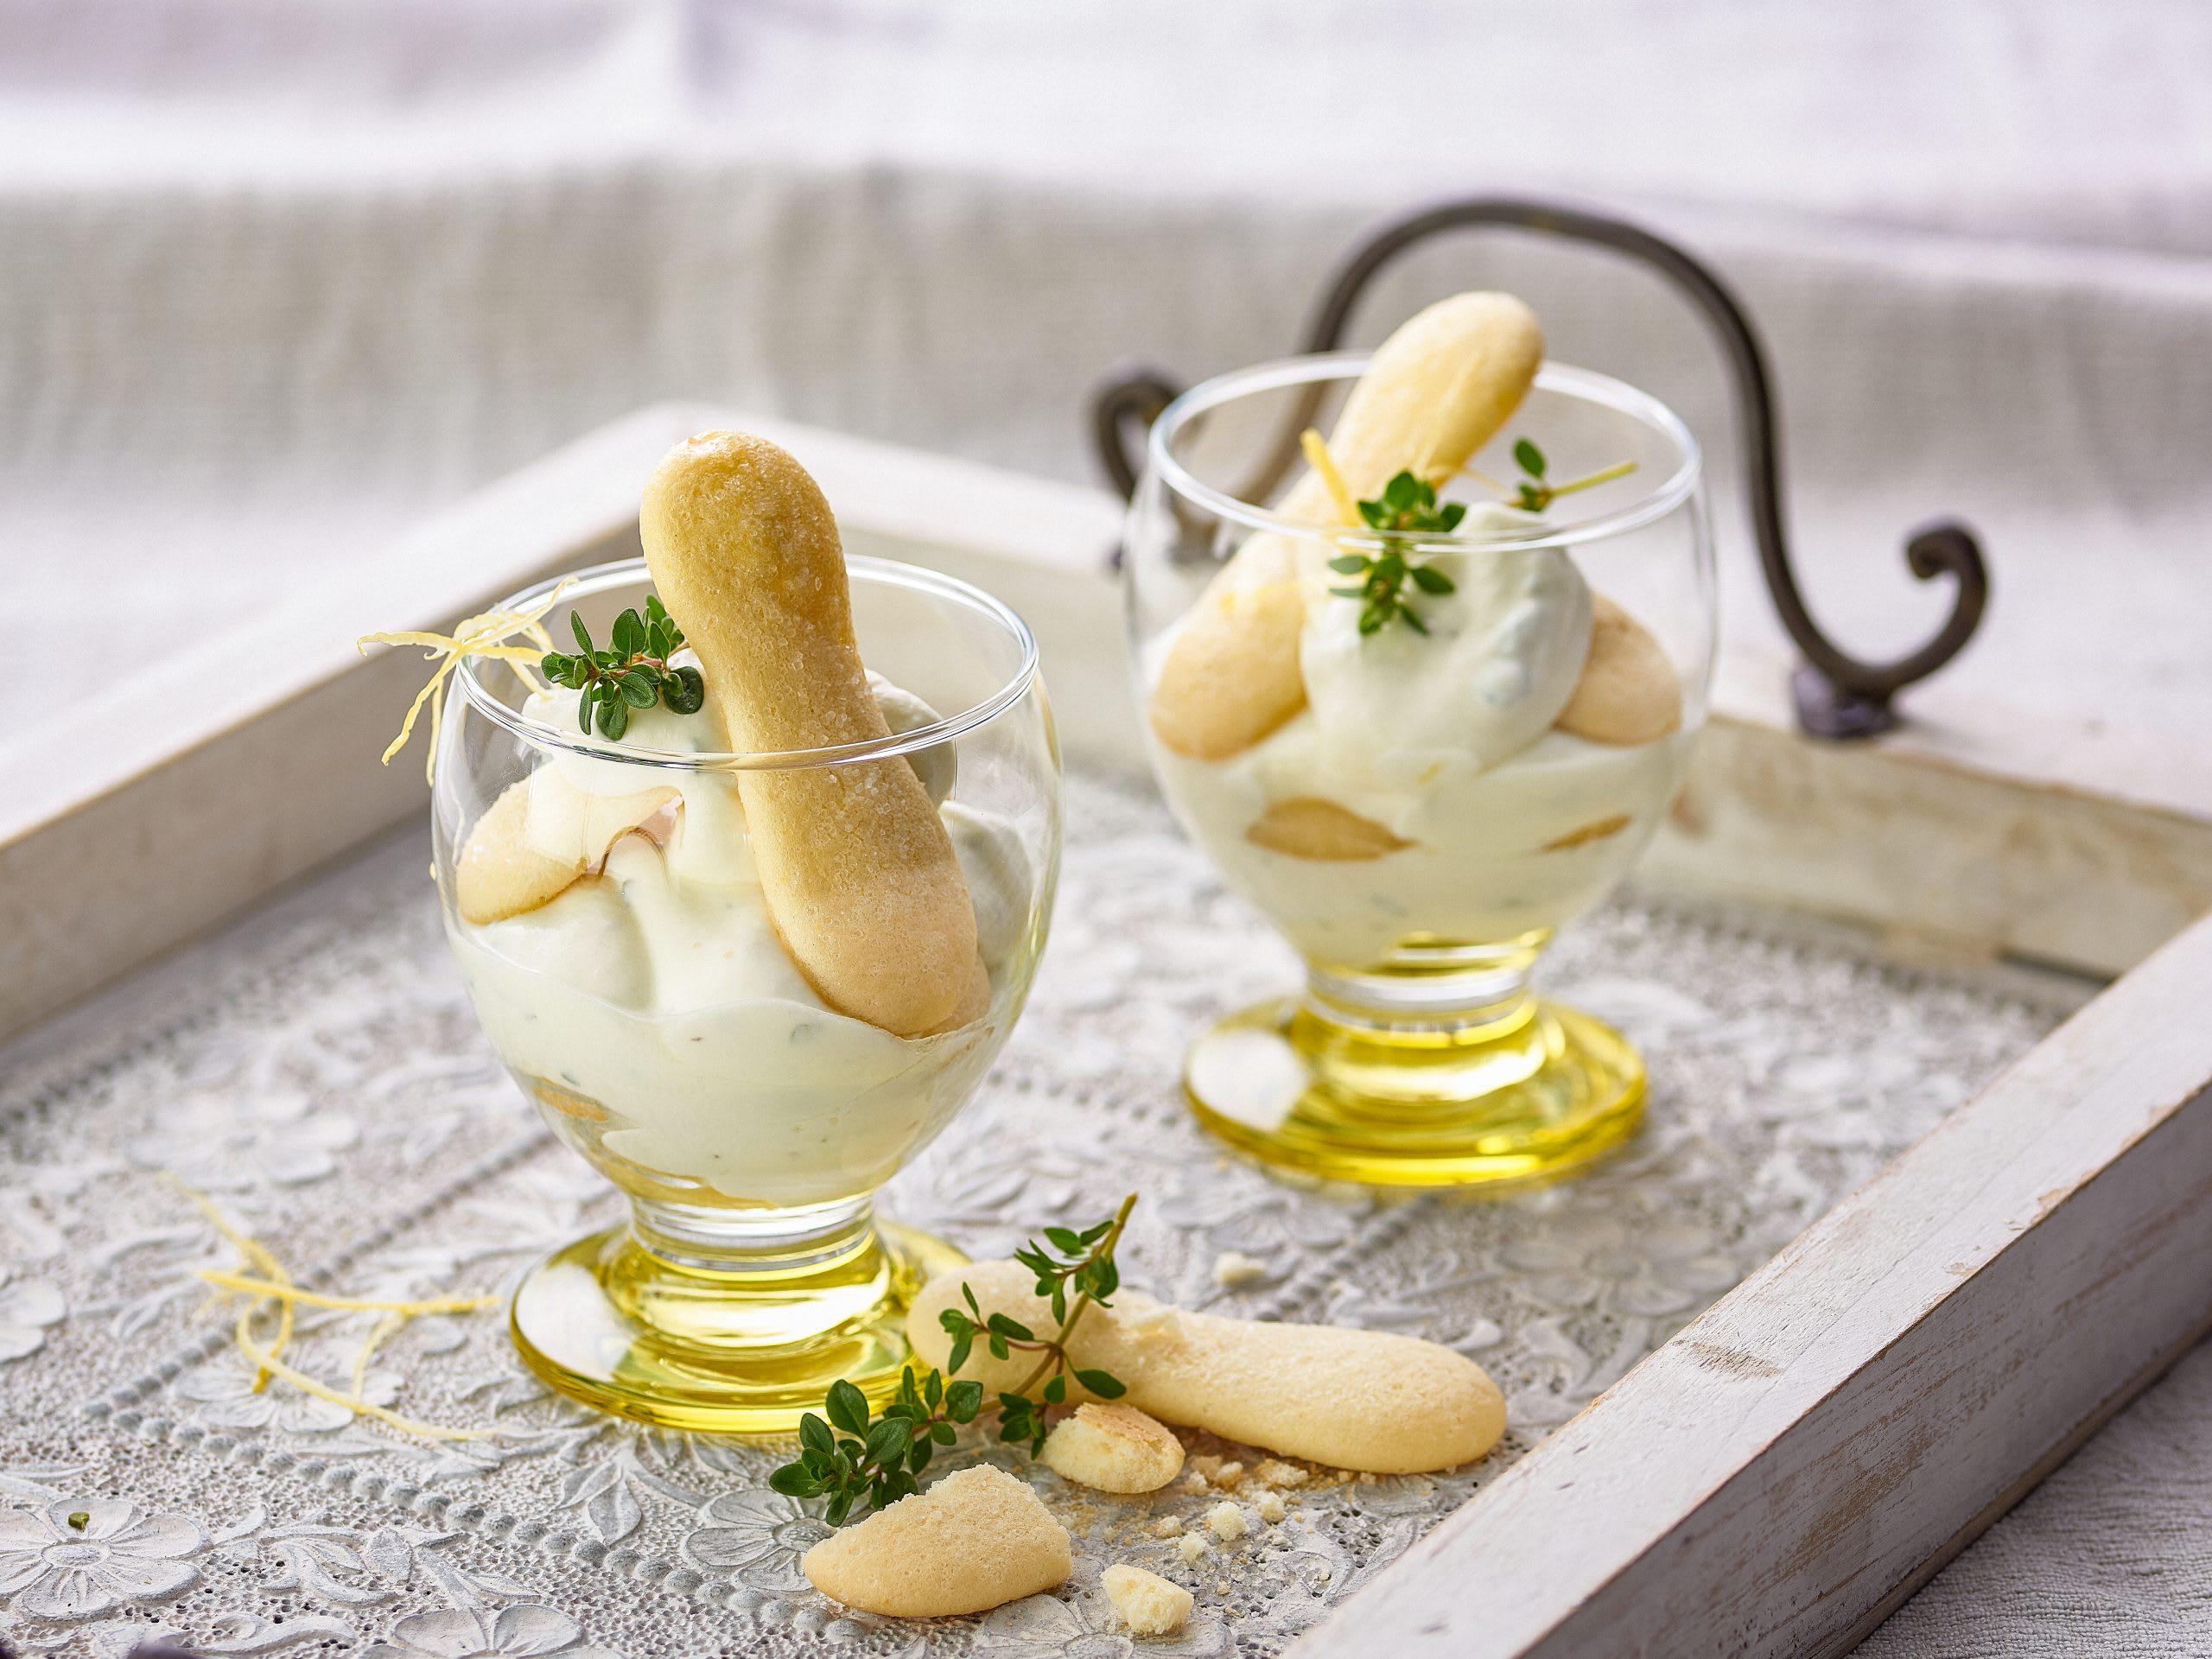 Tiramisu au citron en verrines (sans oeufs)